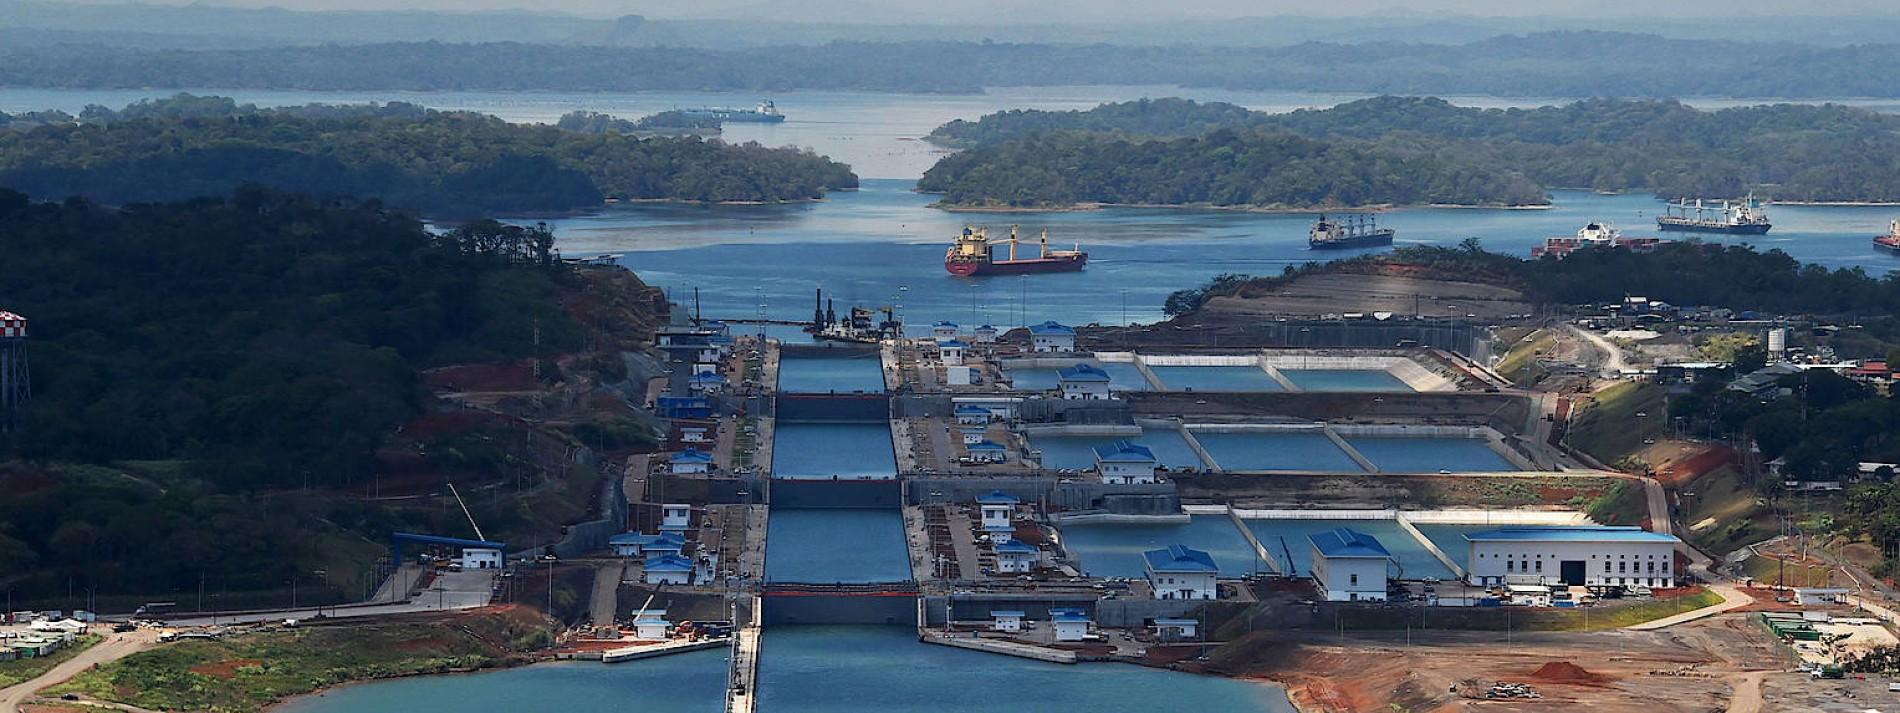 Im Panamakanal wird das Wasser knapp